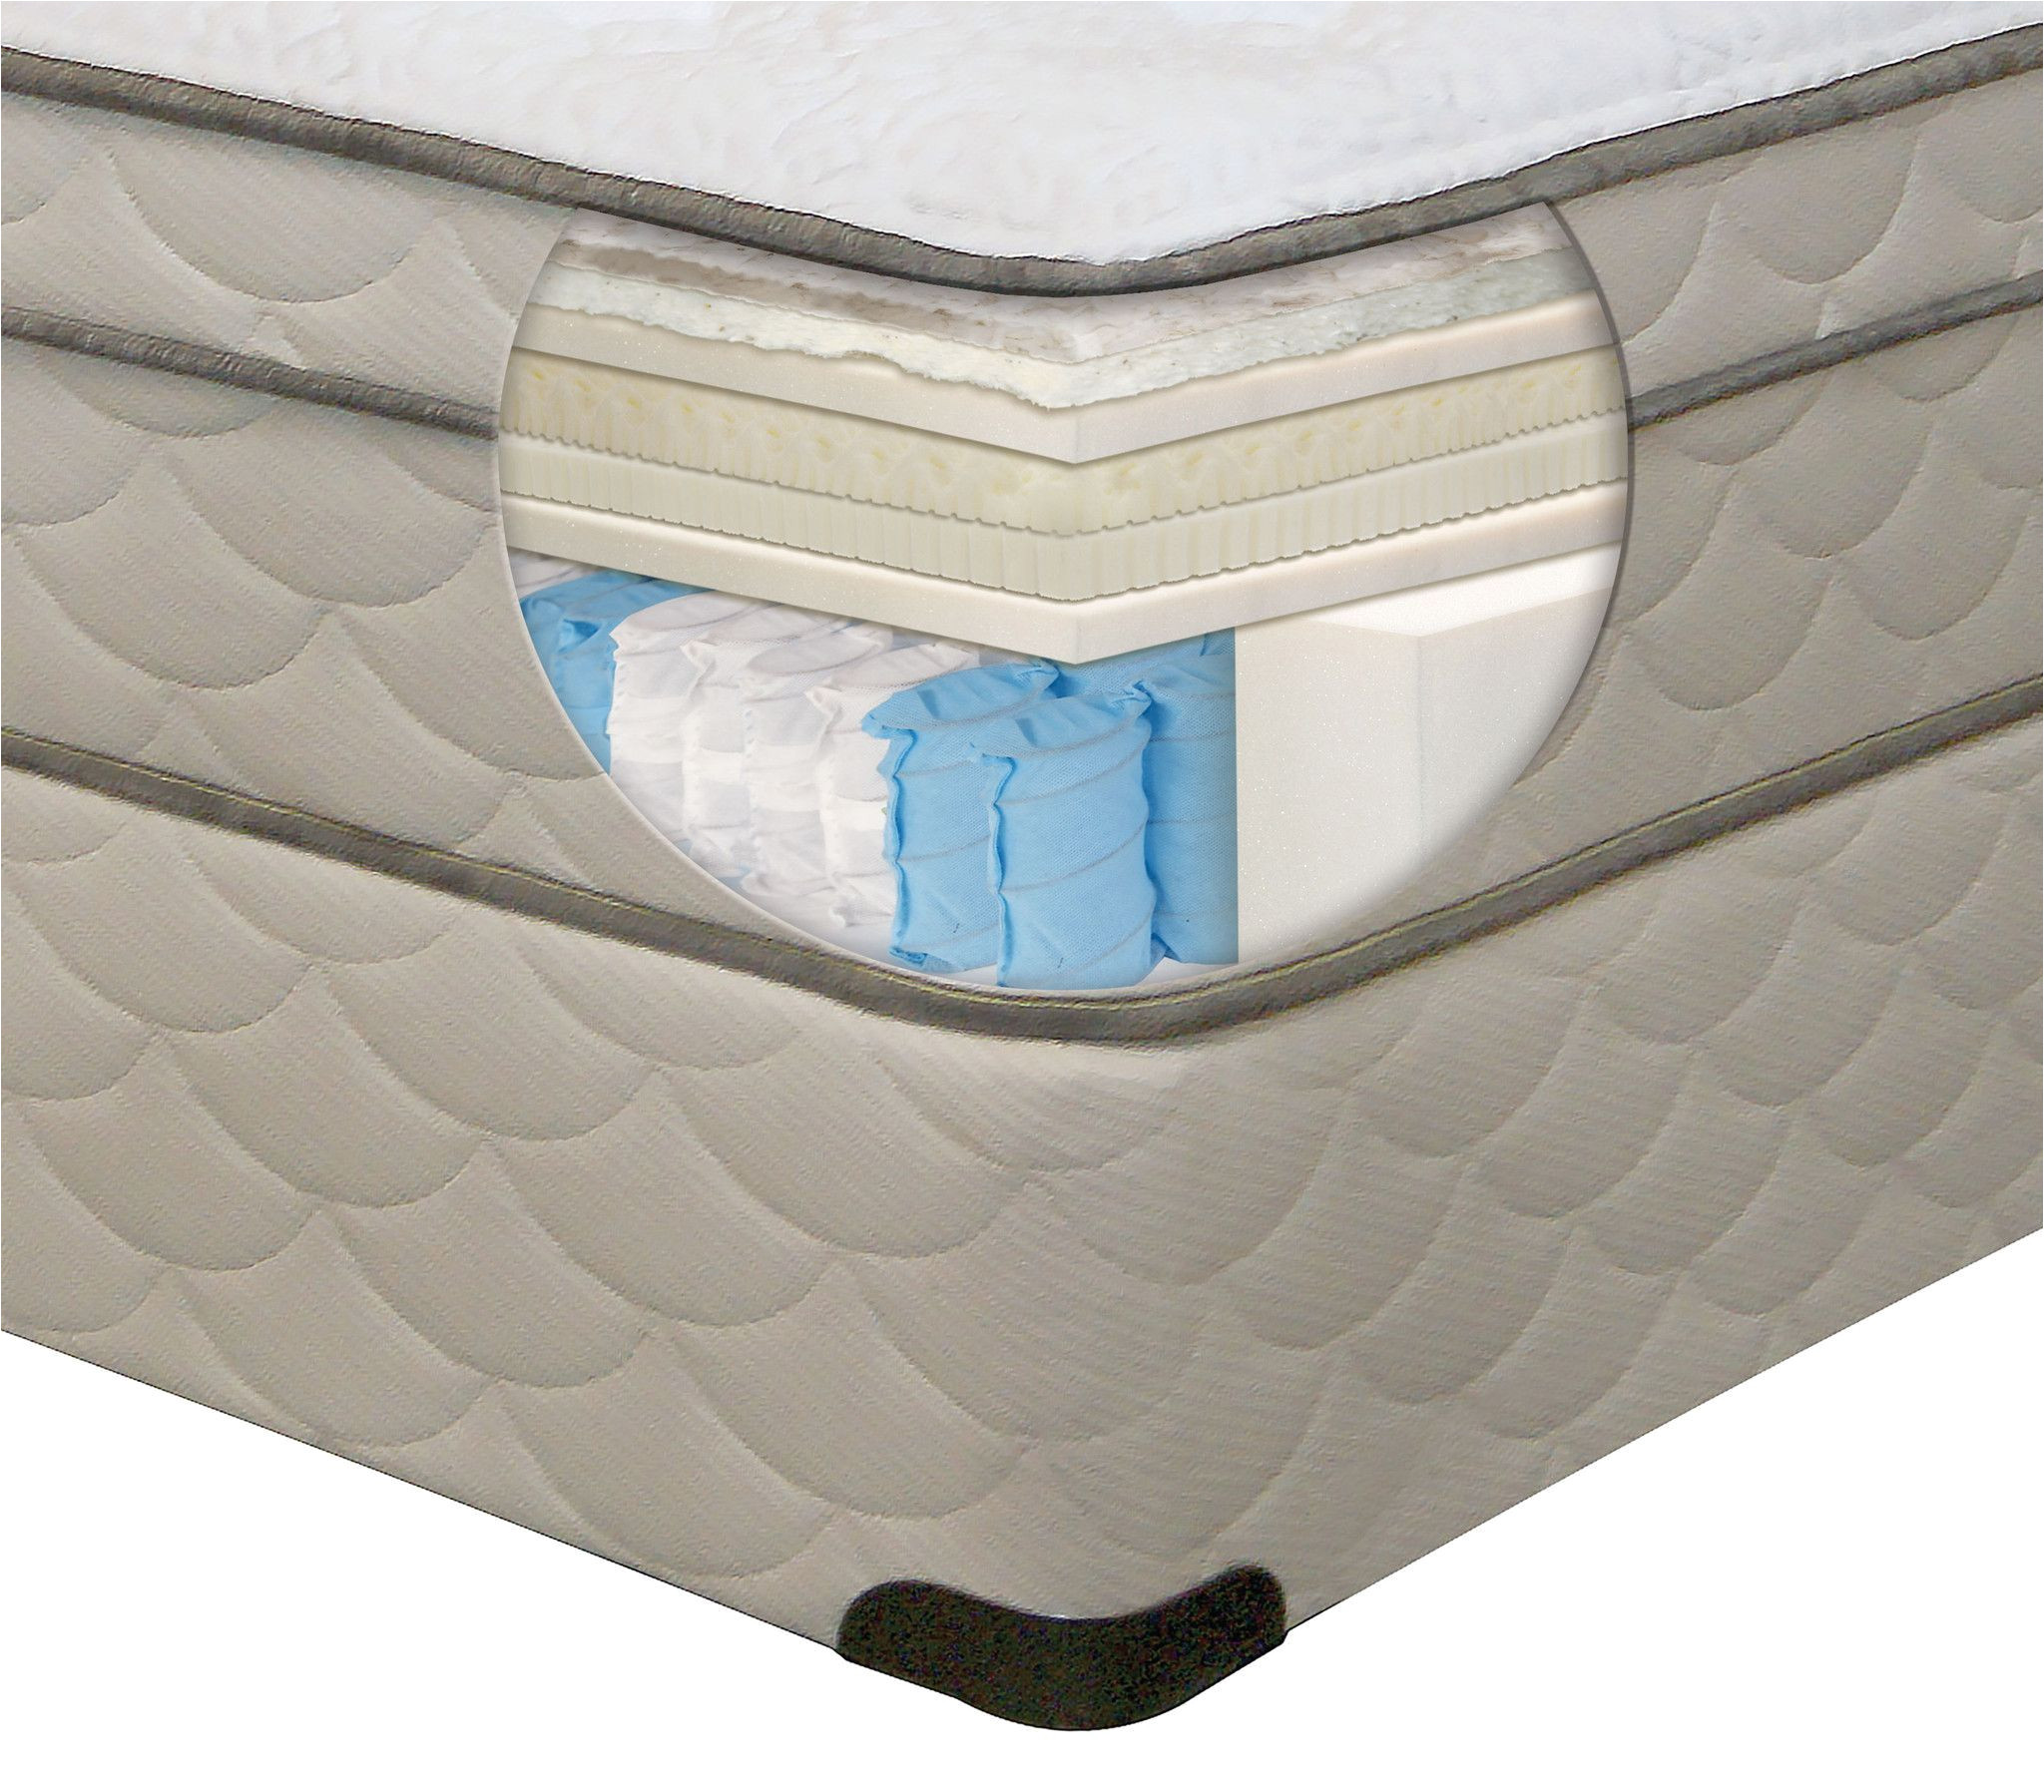 Snuggle Home 10 Inch Two Sided Foam Mattress Reviews Essential Sleep Natural Mattress Bedding Gallery Essentialsleep